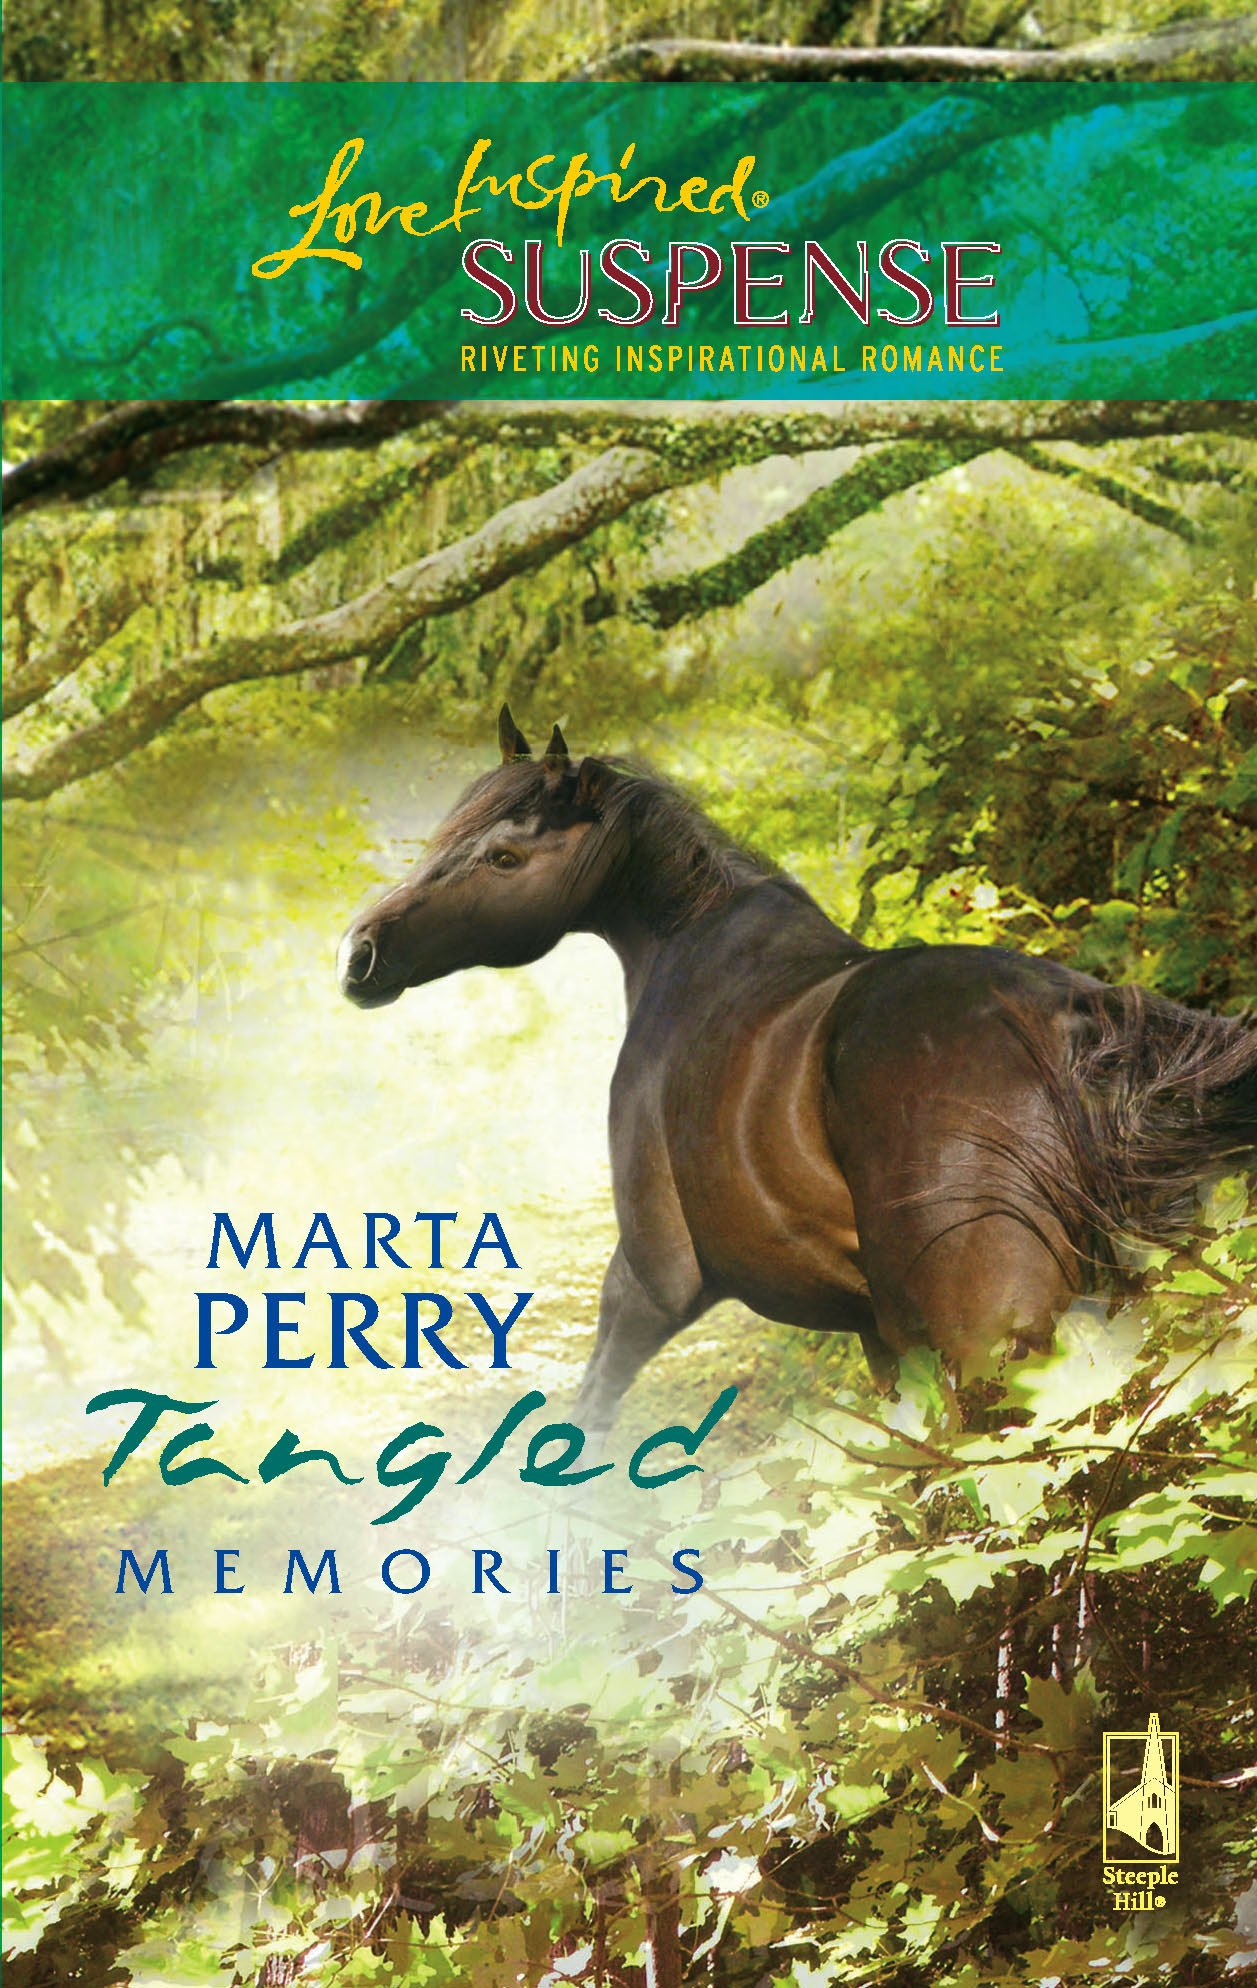 Tangled Memories (Lowcountry Suspense Series #2) (Steeple Hill Love Inspired Suspense #28) ebook